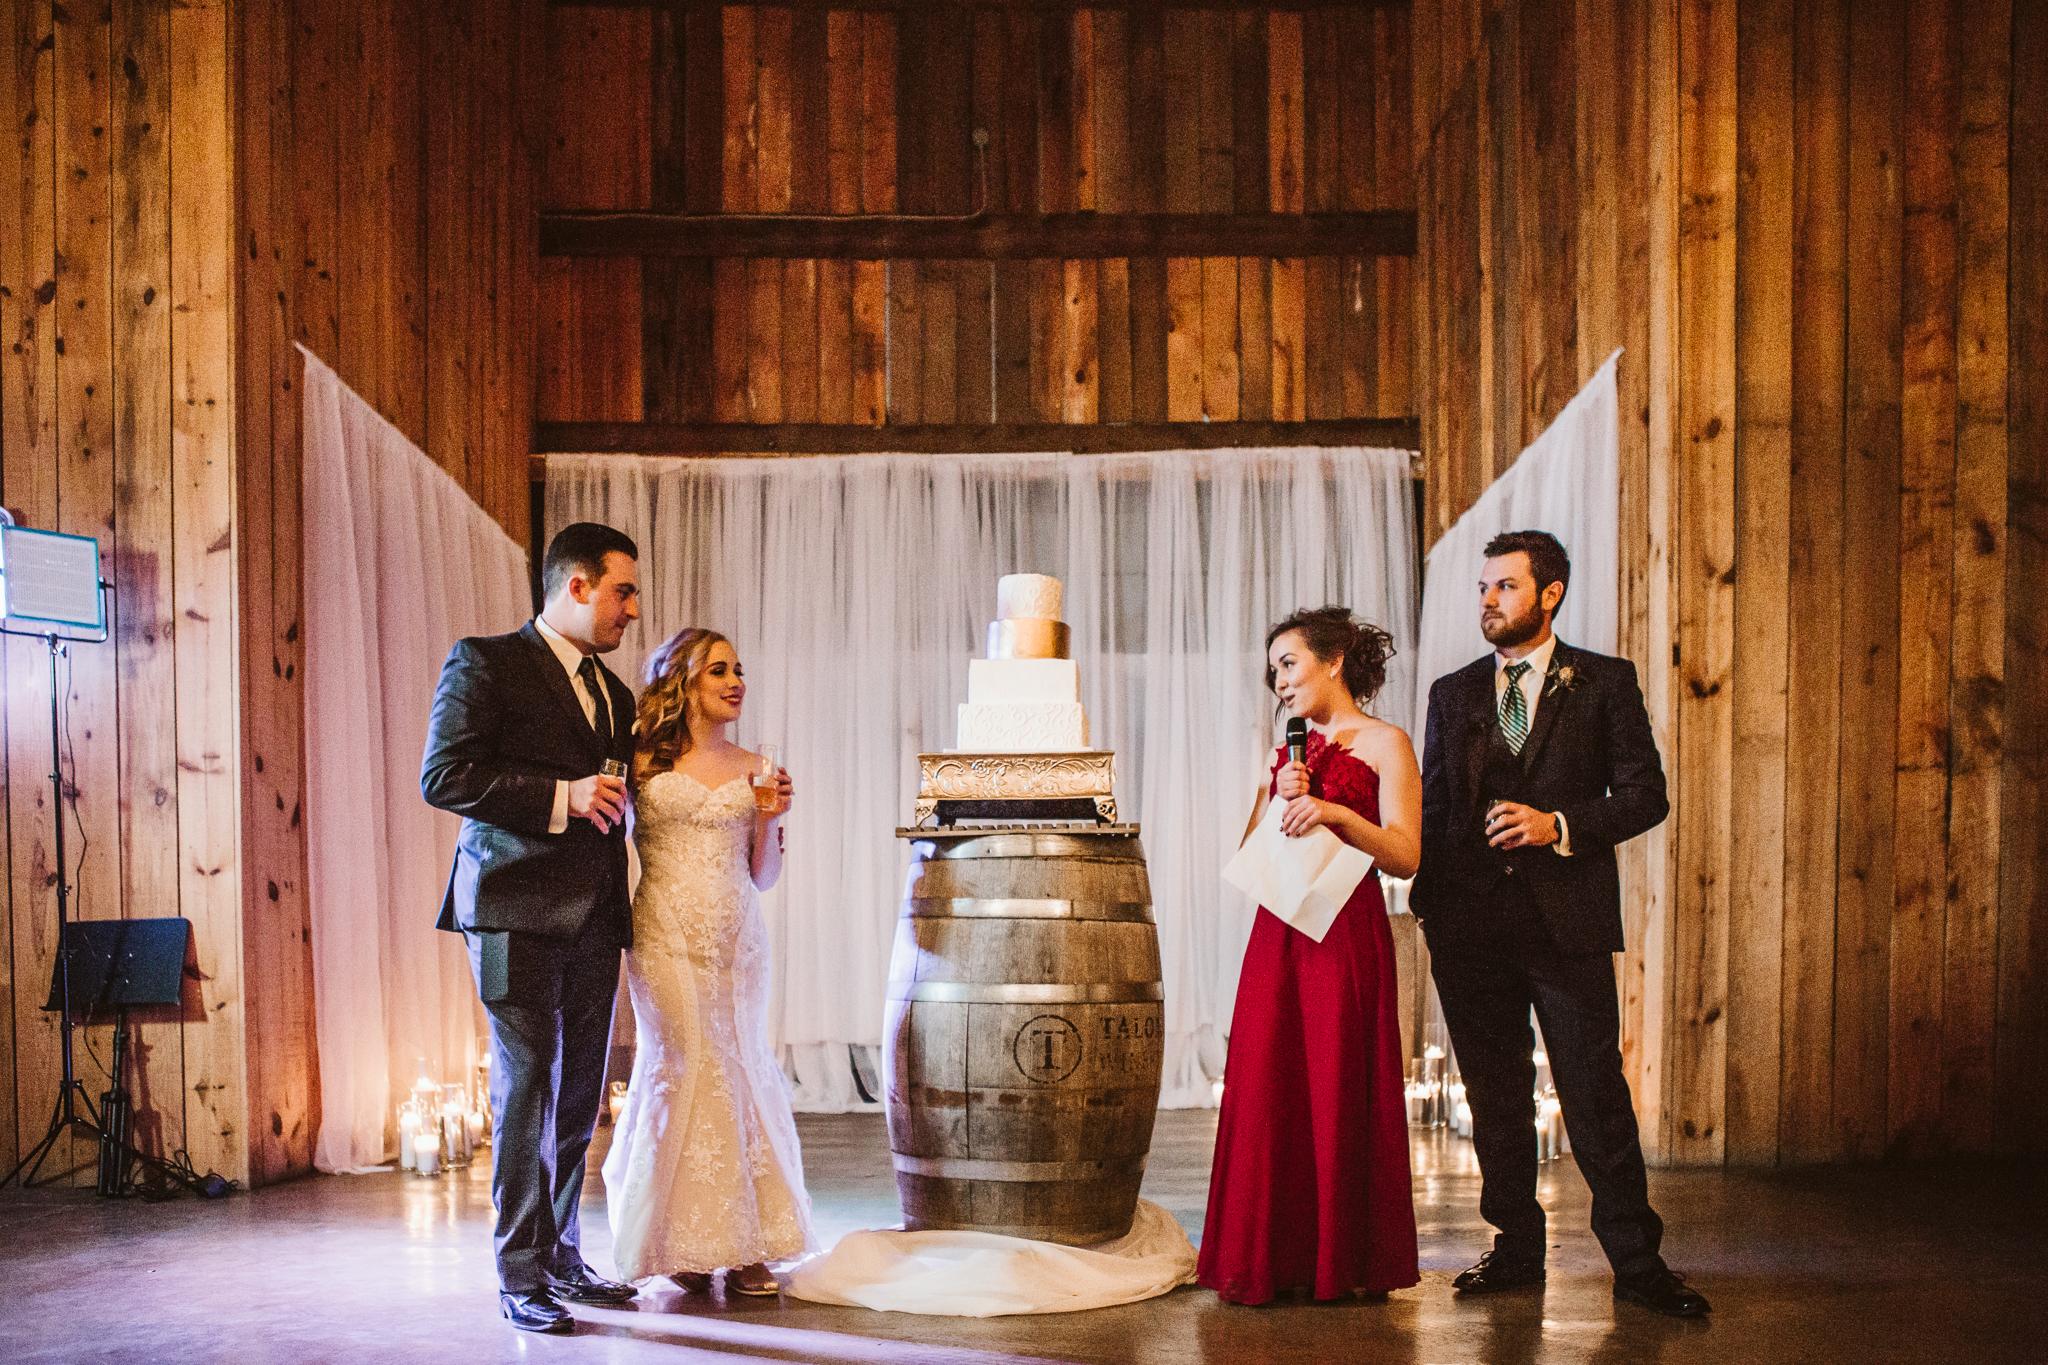 0158 Ariana Jordan Photo - Cameron & Lauren's Wedding at Talon Winery  9506.jpg